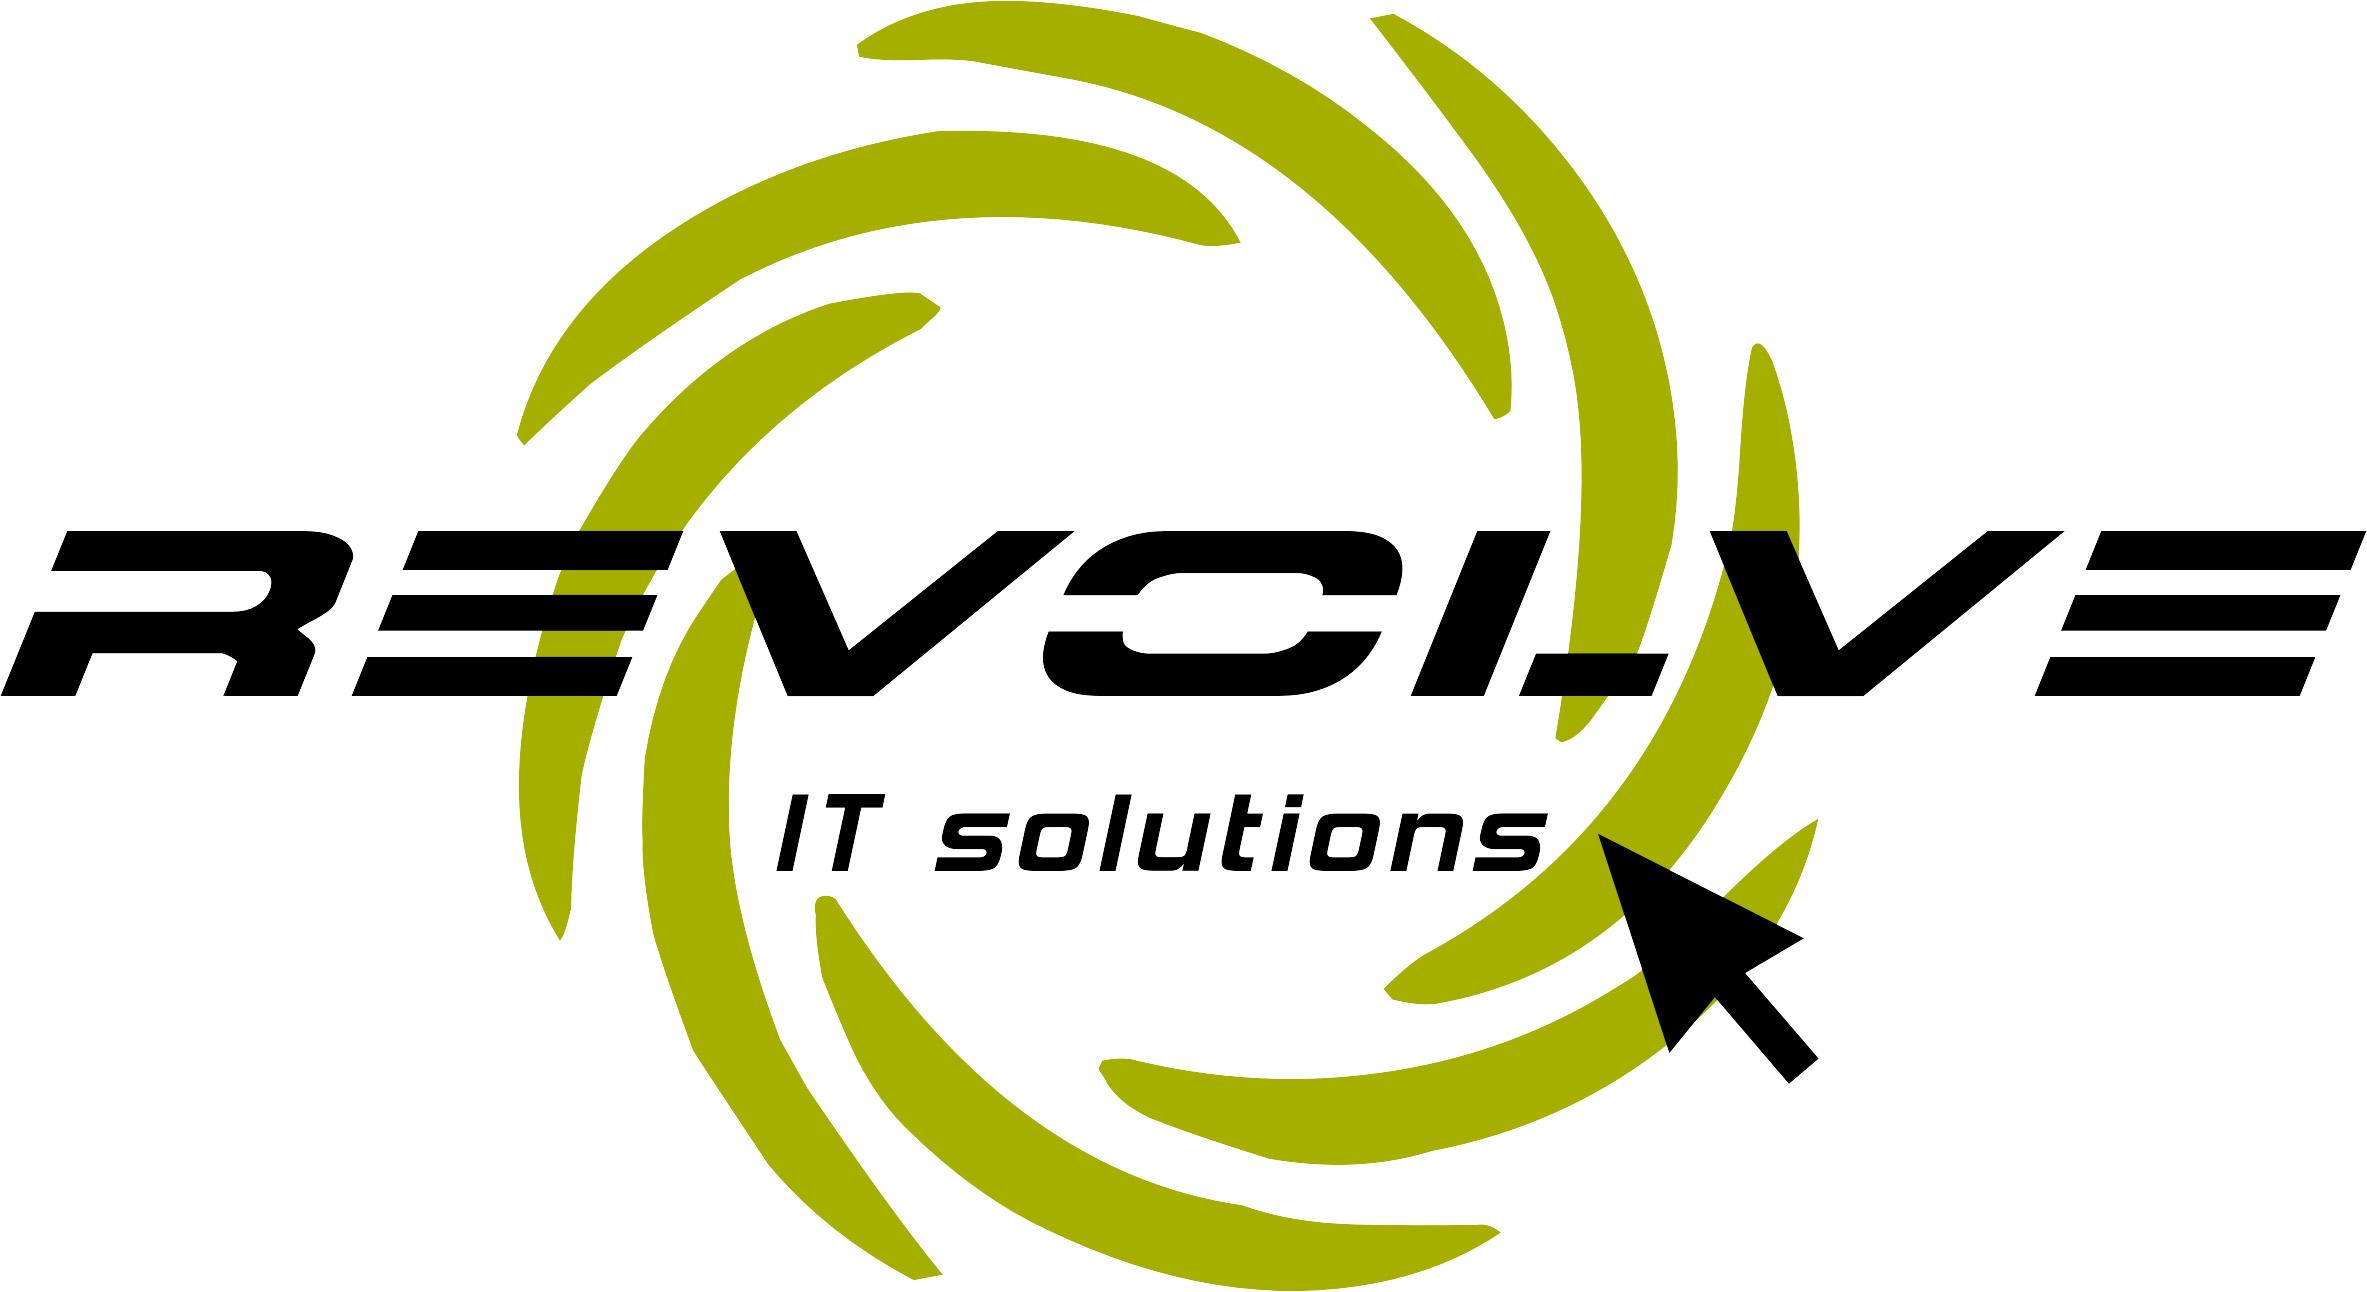 Revolve-IT